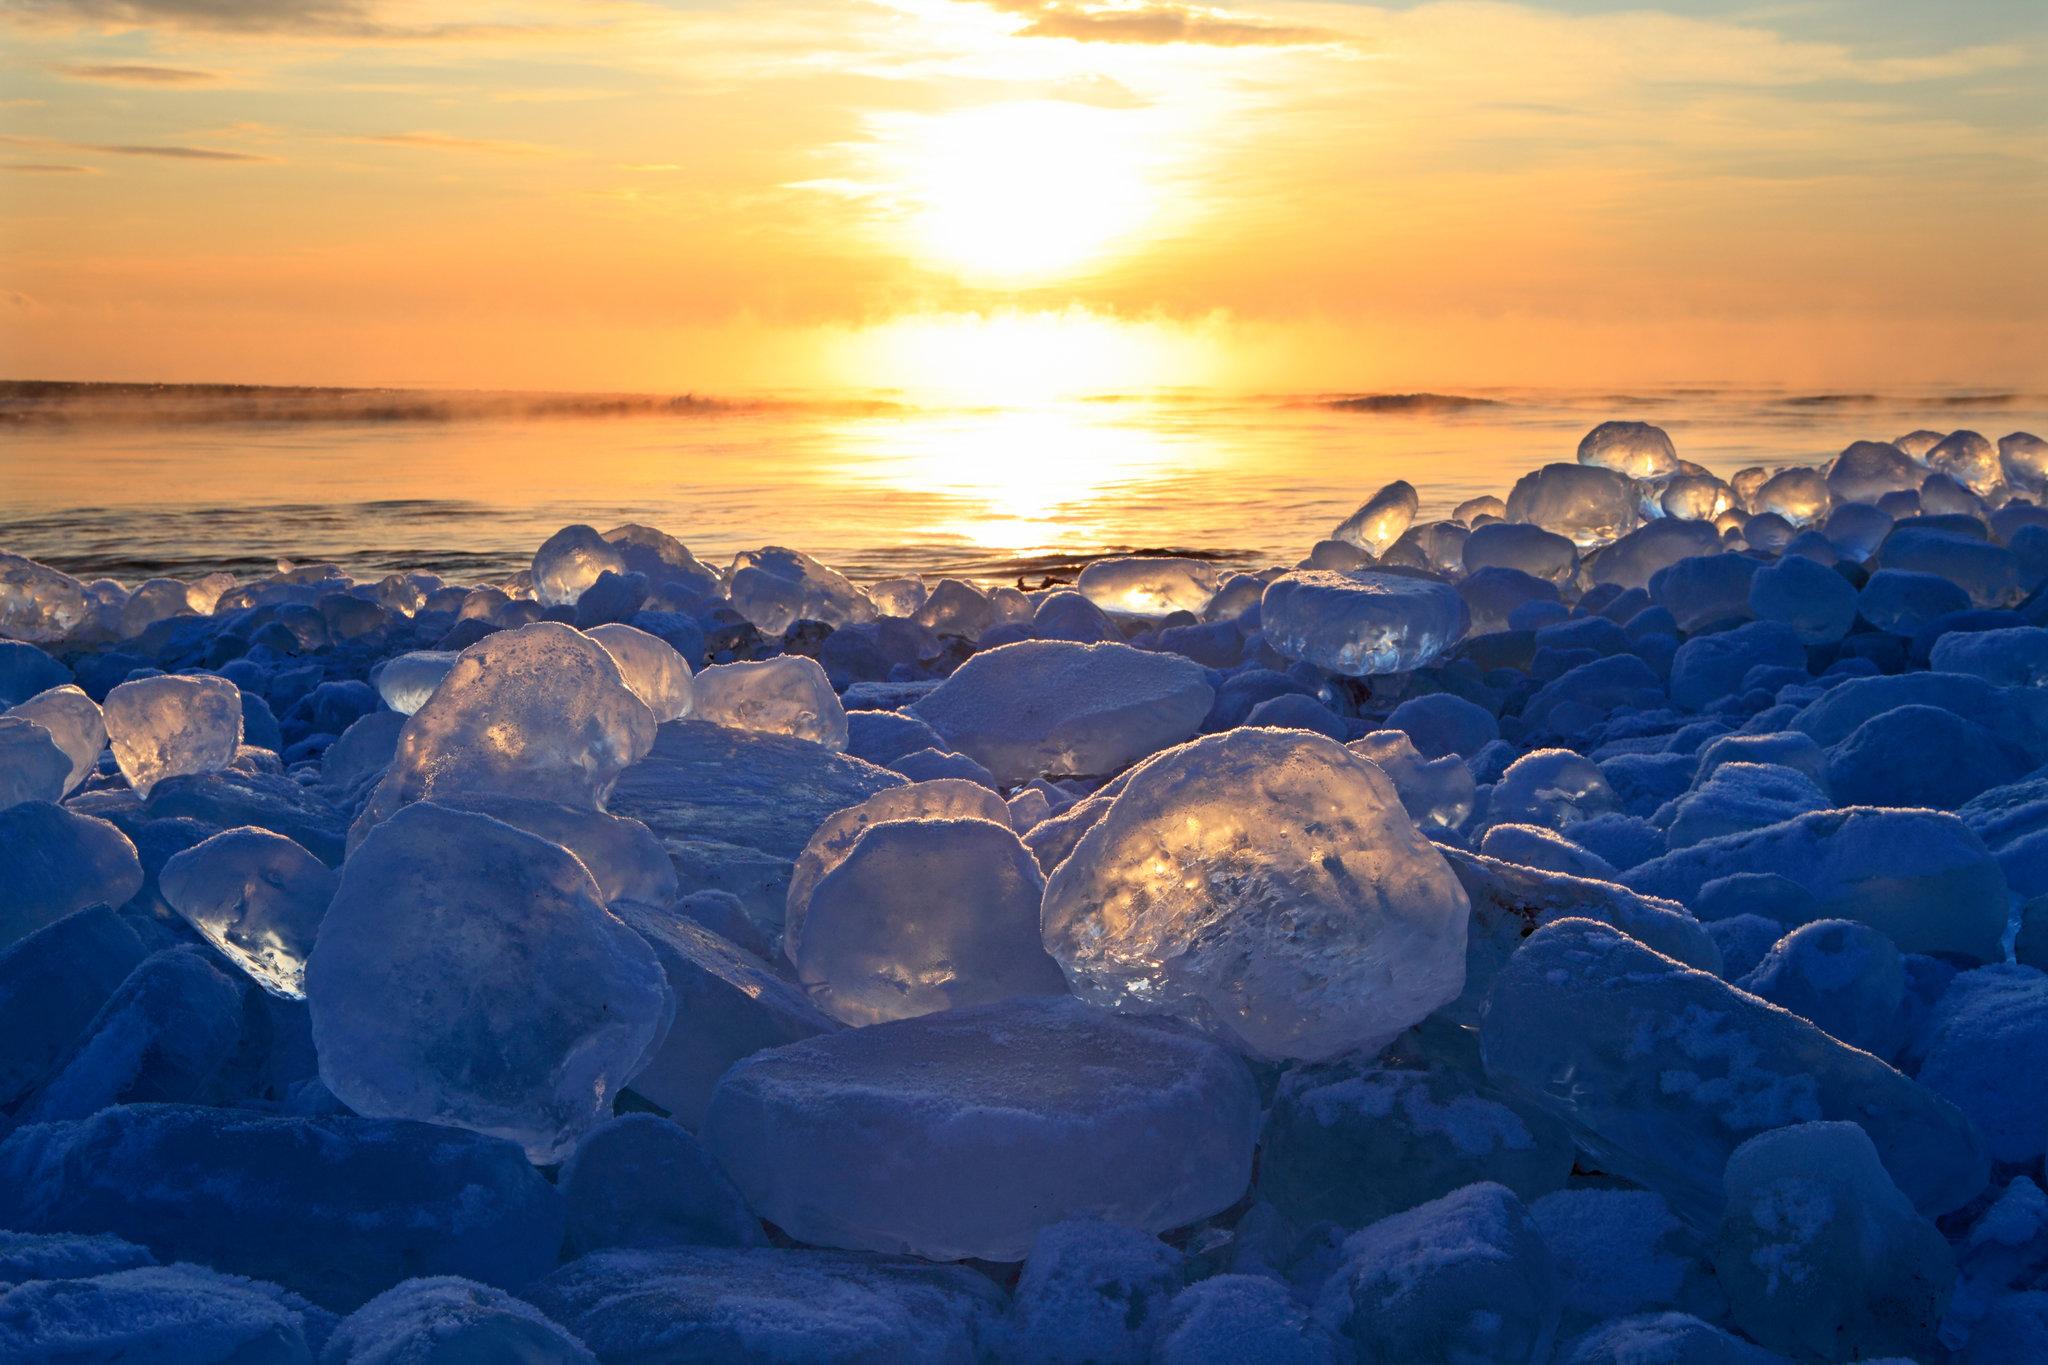 ice jewel shine like diamond on Japanese shores